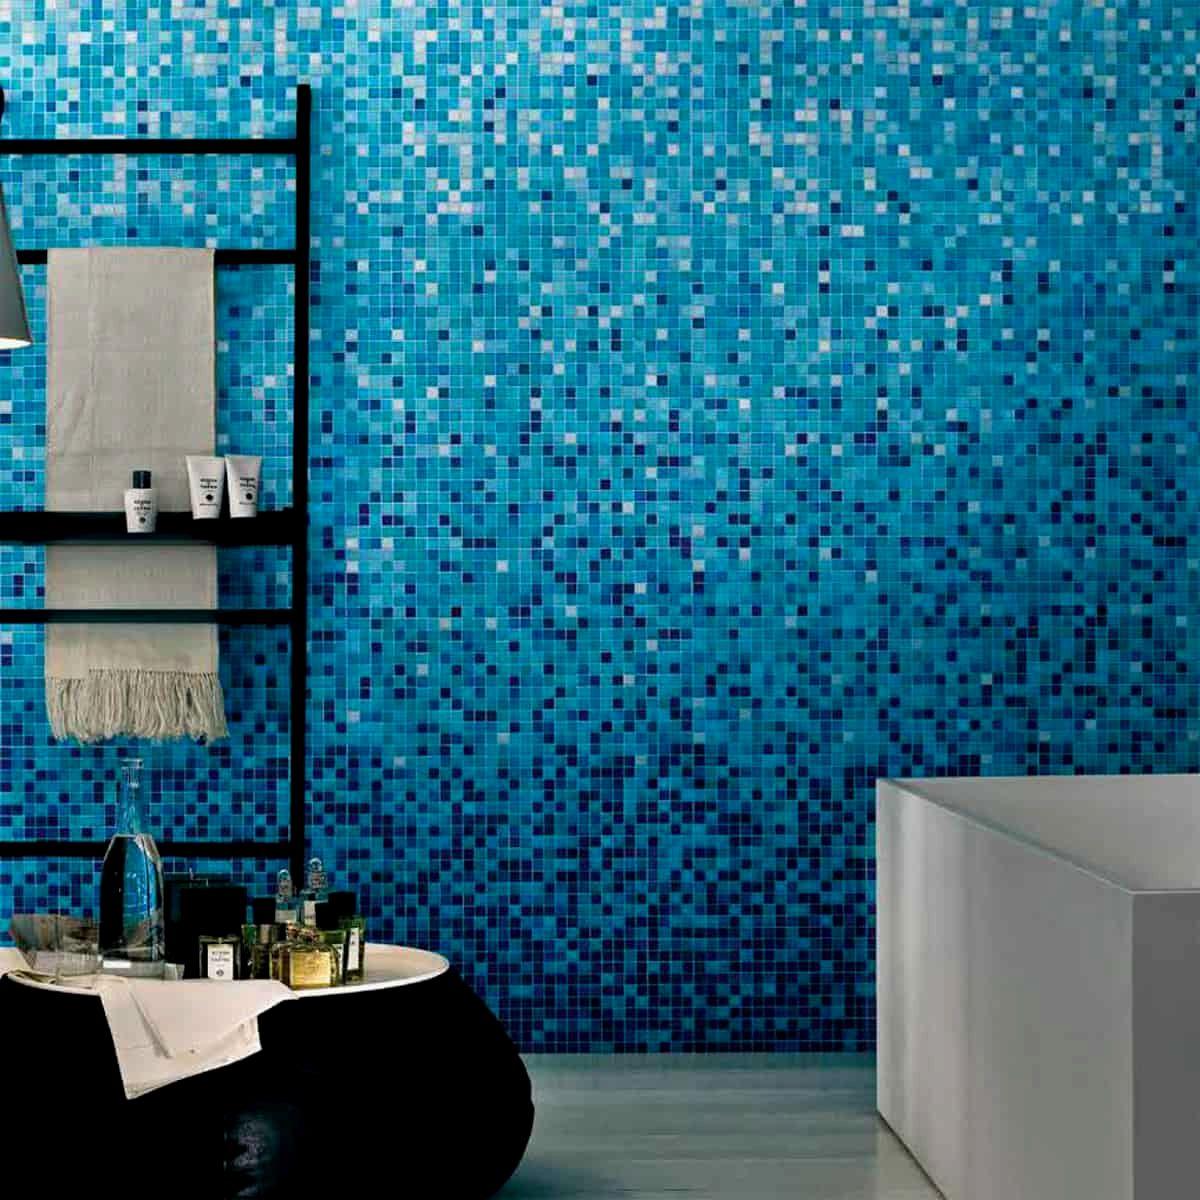 amazing tile walls in bathroom wallpaper-Inspirational Tile Walls In Bathroom Model